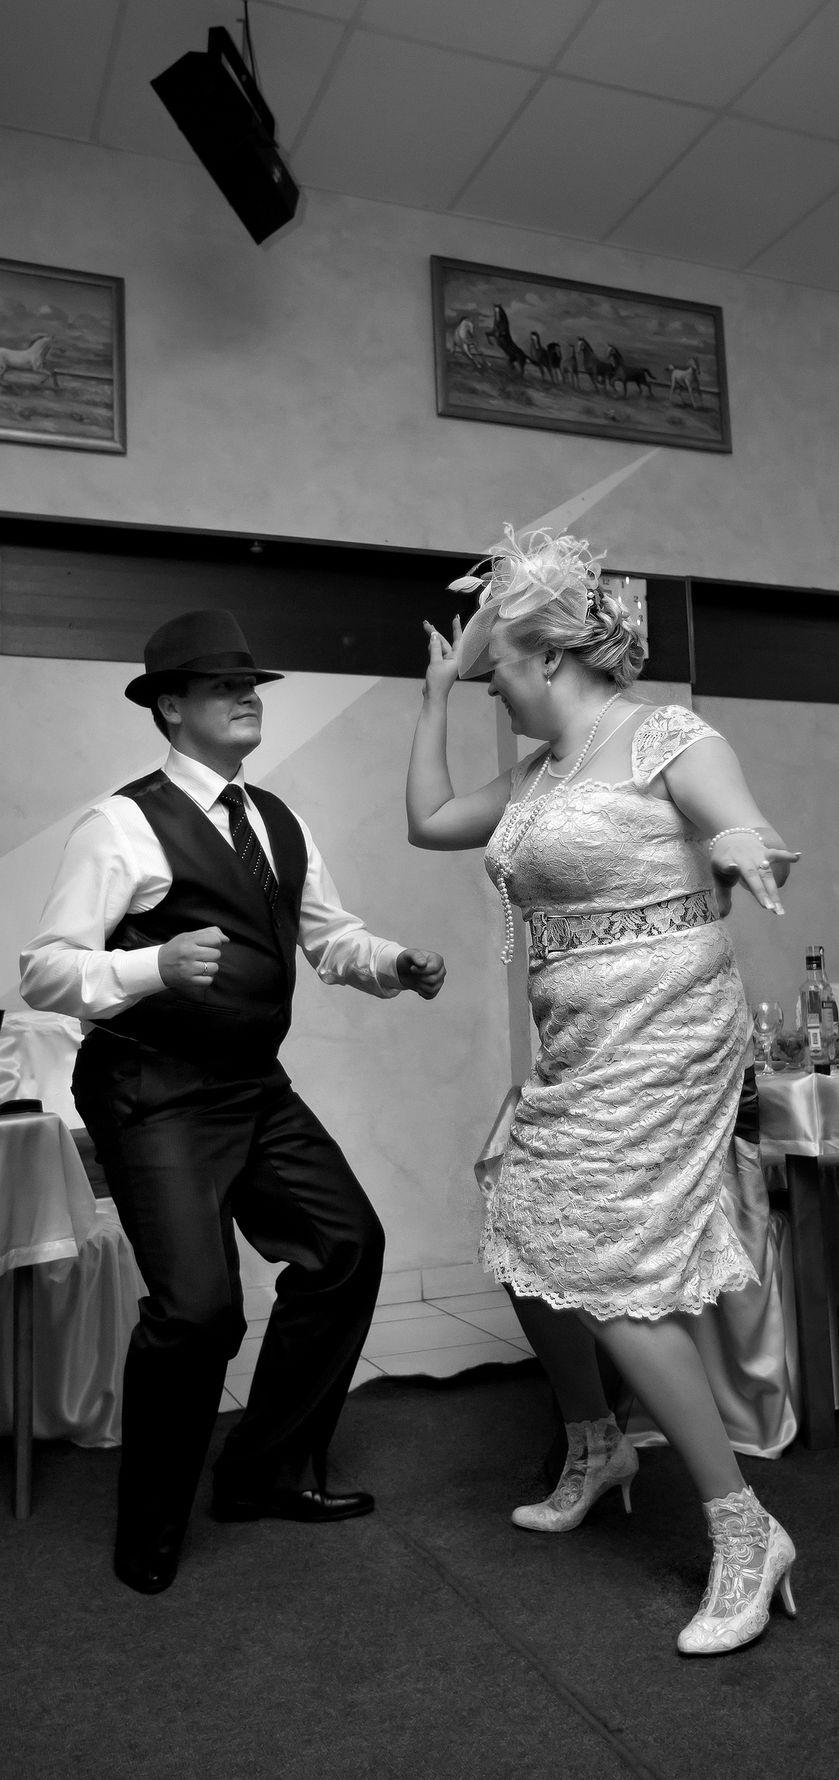 Ваня и Оля 2011 - фото 2971363 Фотограф Якушев Николай